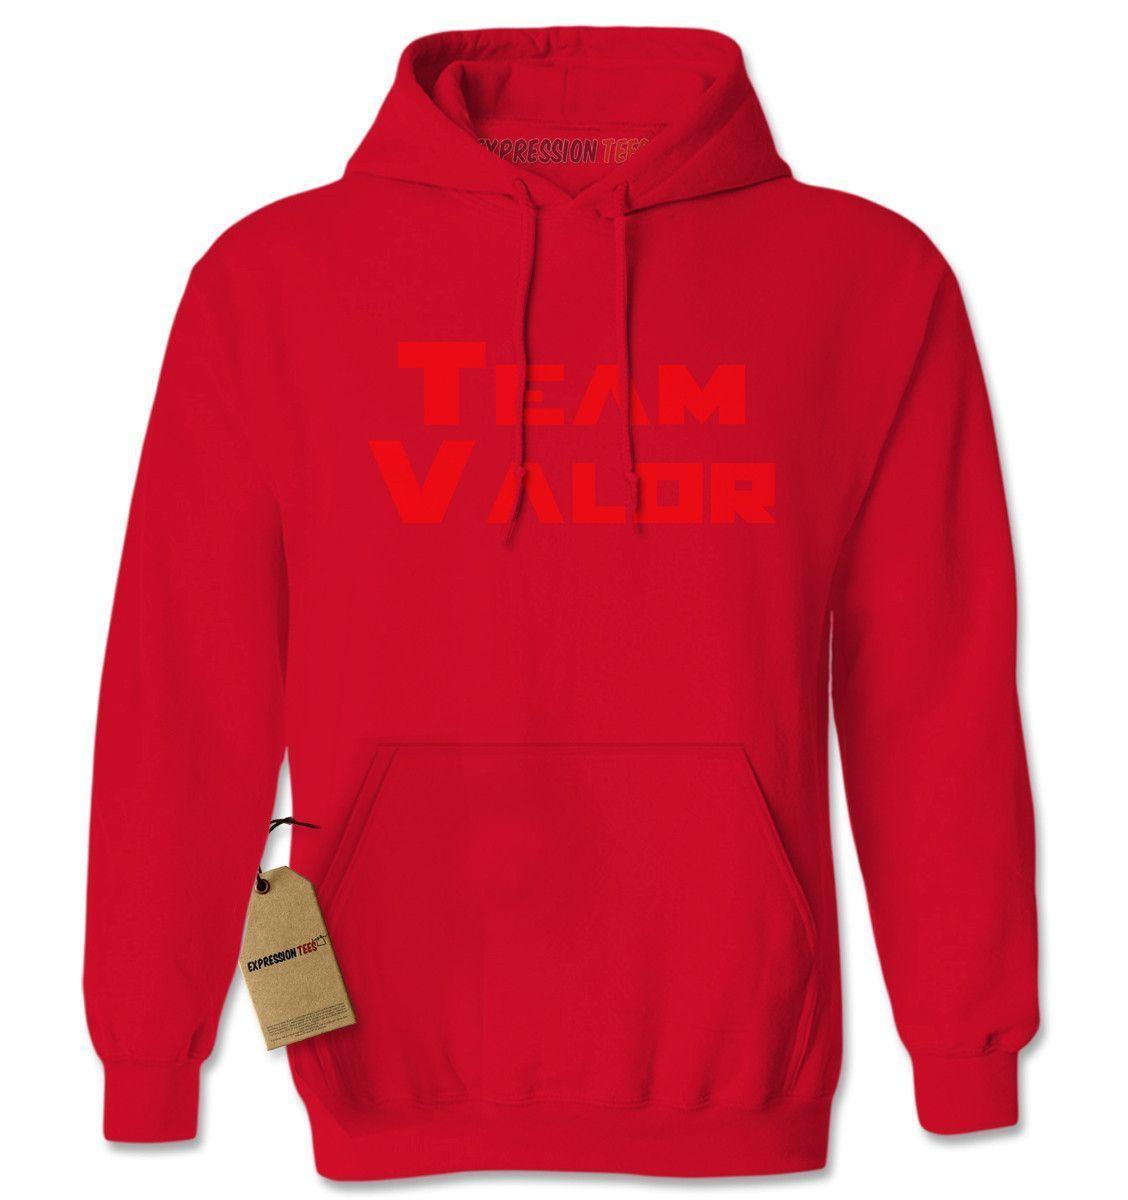 Team Valor - Represent Your GO Faction Adult Hoodie Sweatshirt